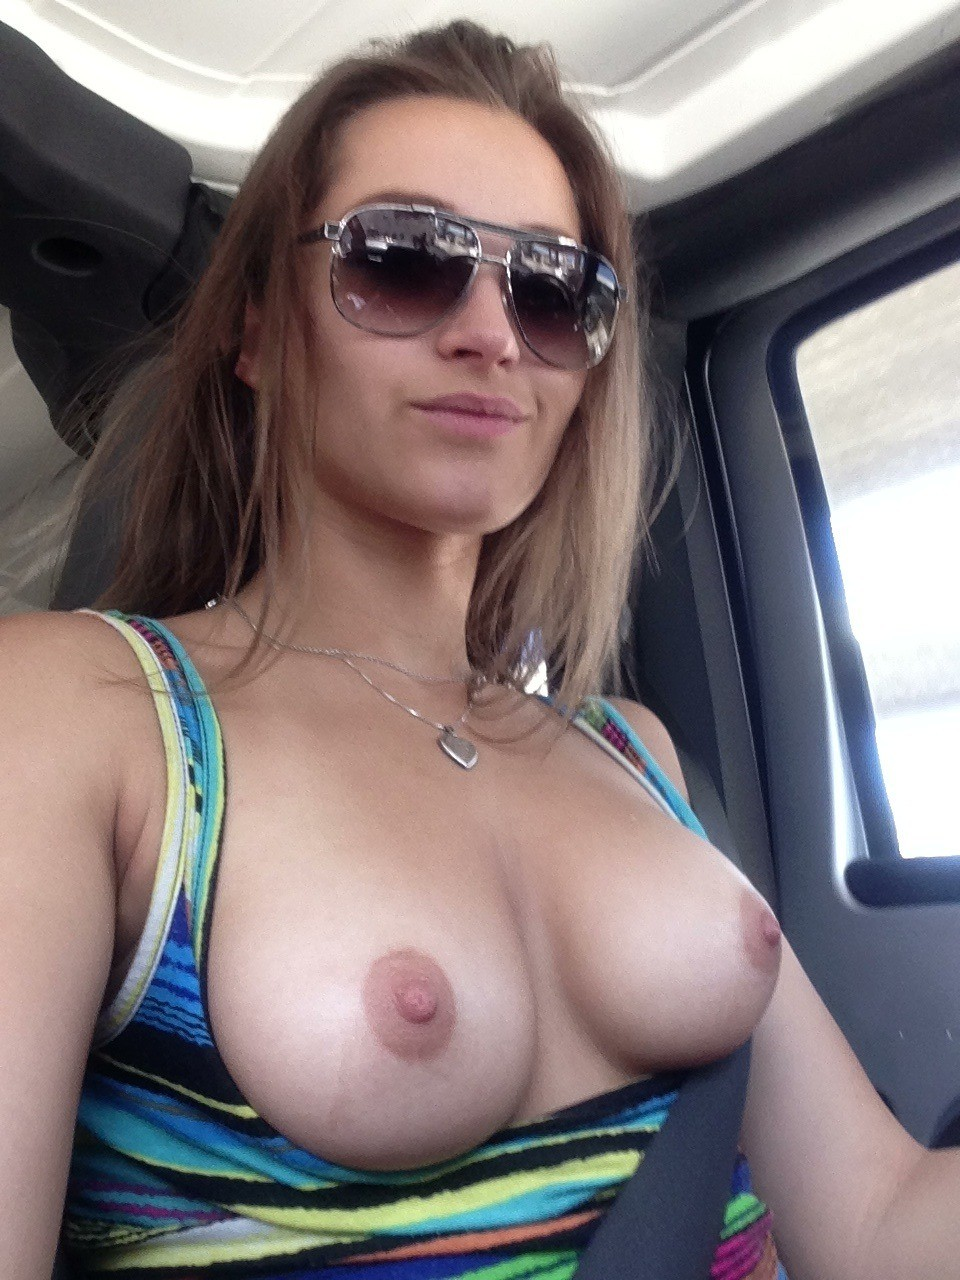 jasmine caro spizoo naked sexy girls photos